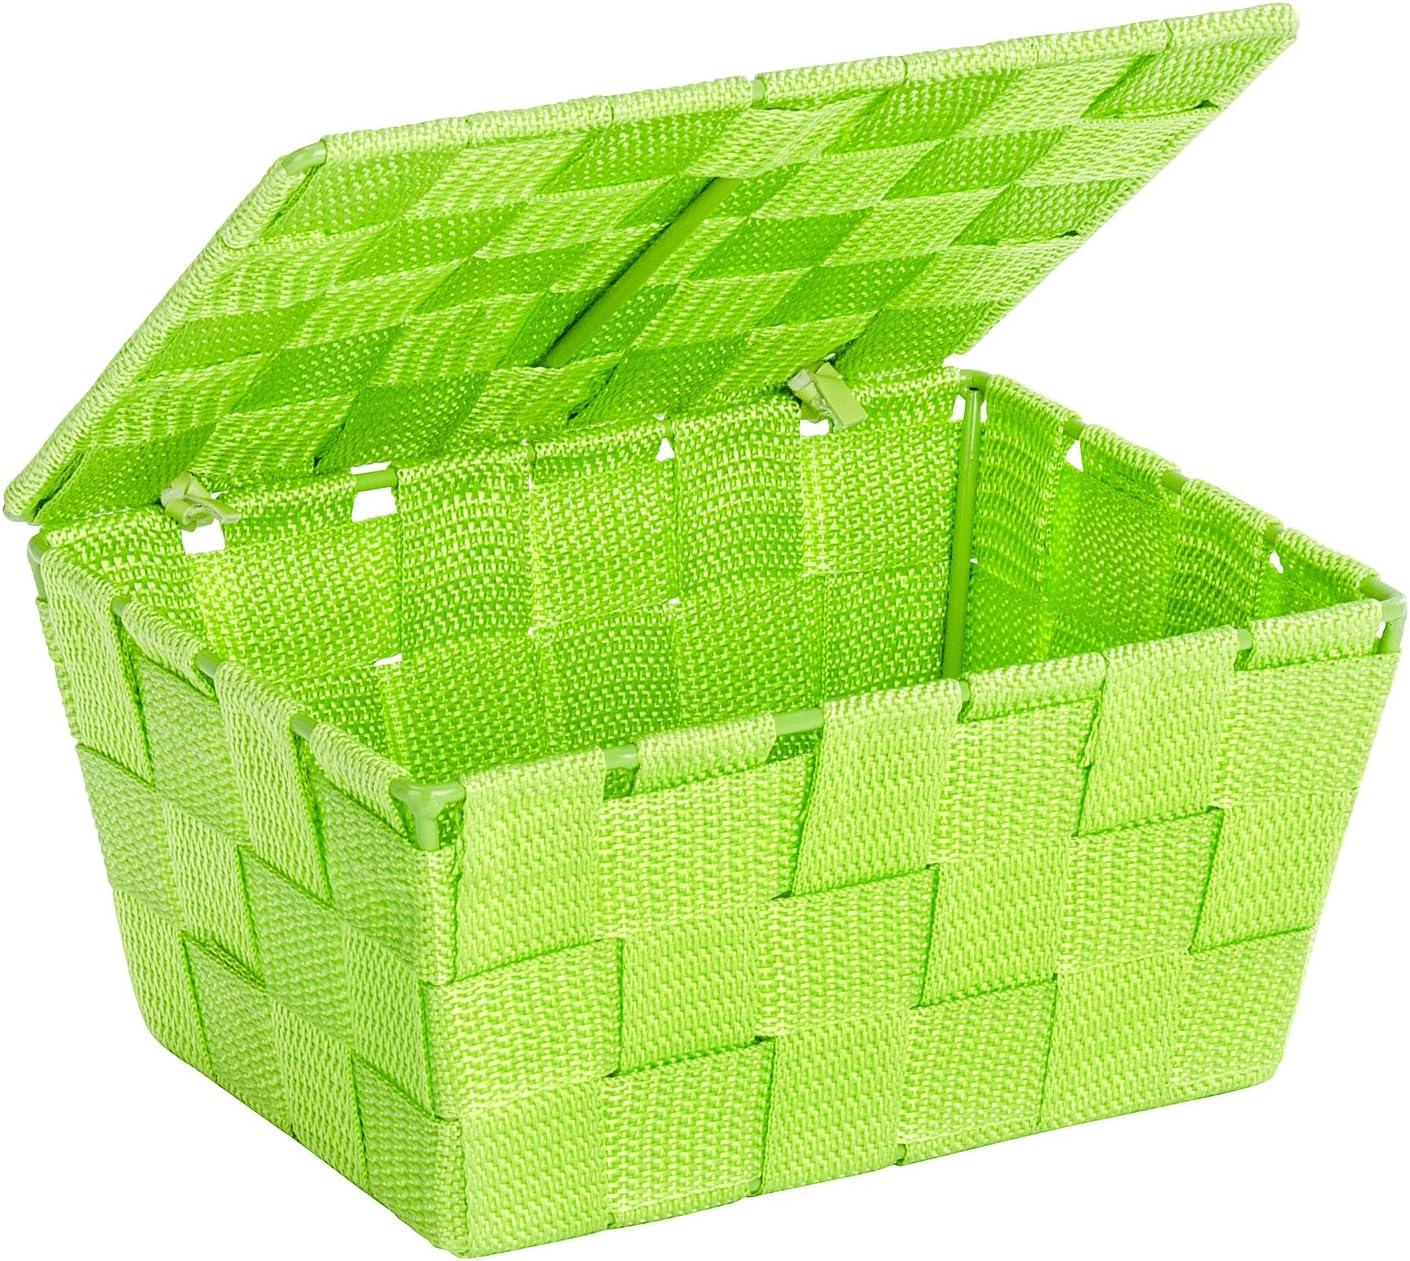 Polypropyl/ène WENKO 22204100 Panier de Rangement avec Couvercle Adria Vert 19 x 10 x 14 cm